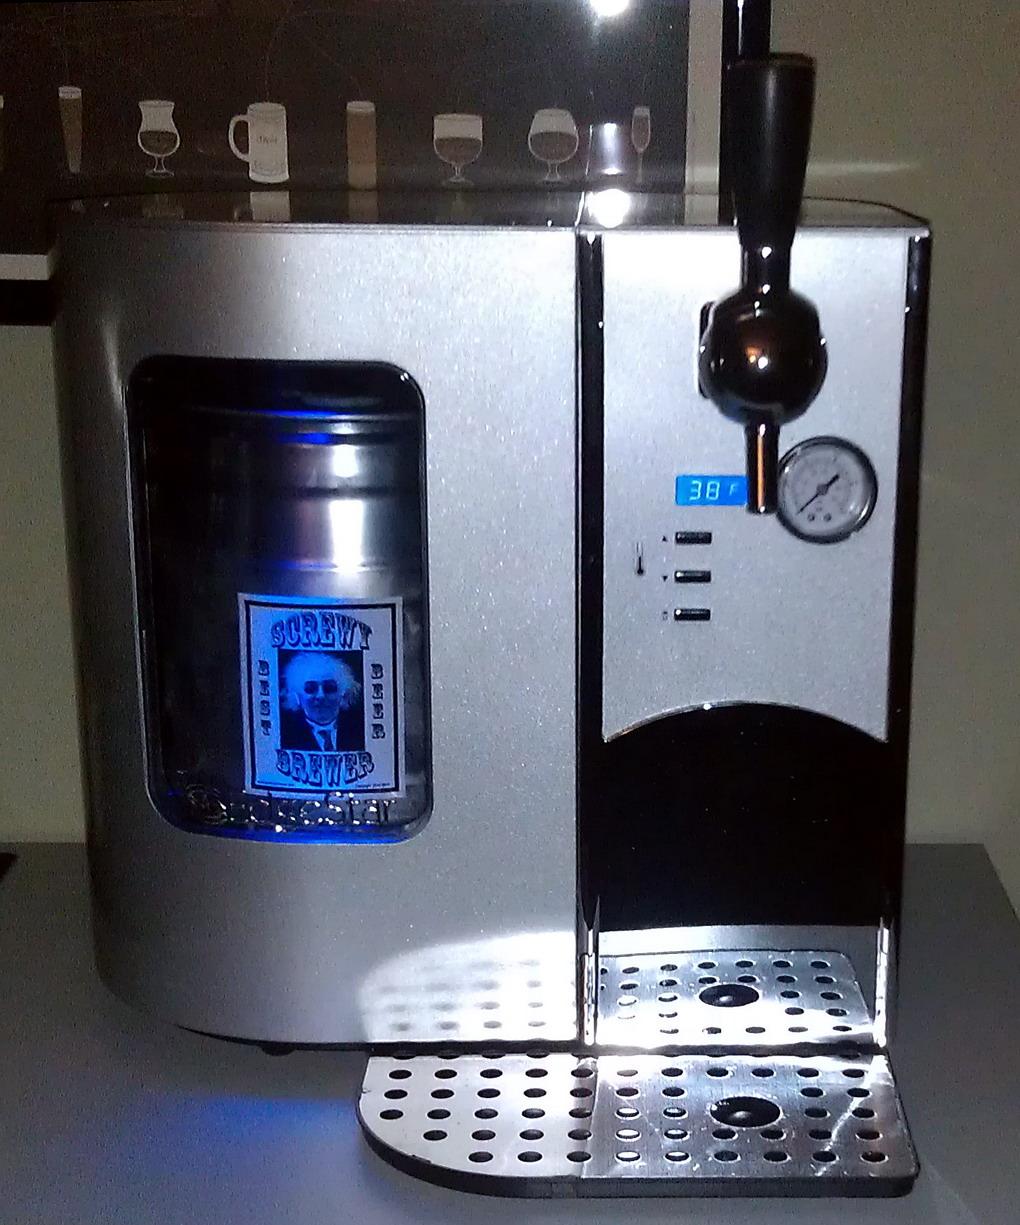 The Screwy Brewer Edgestar Deluxe Mini Kegerator